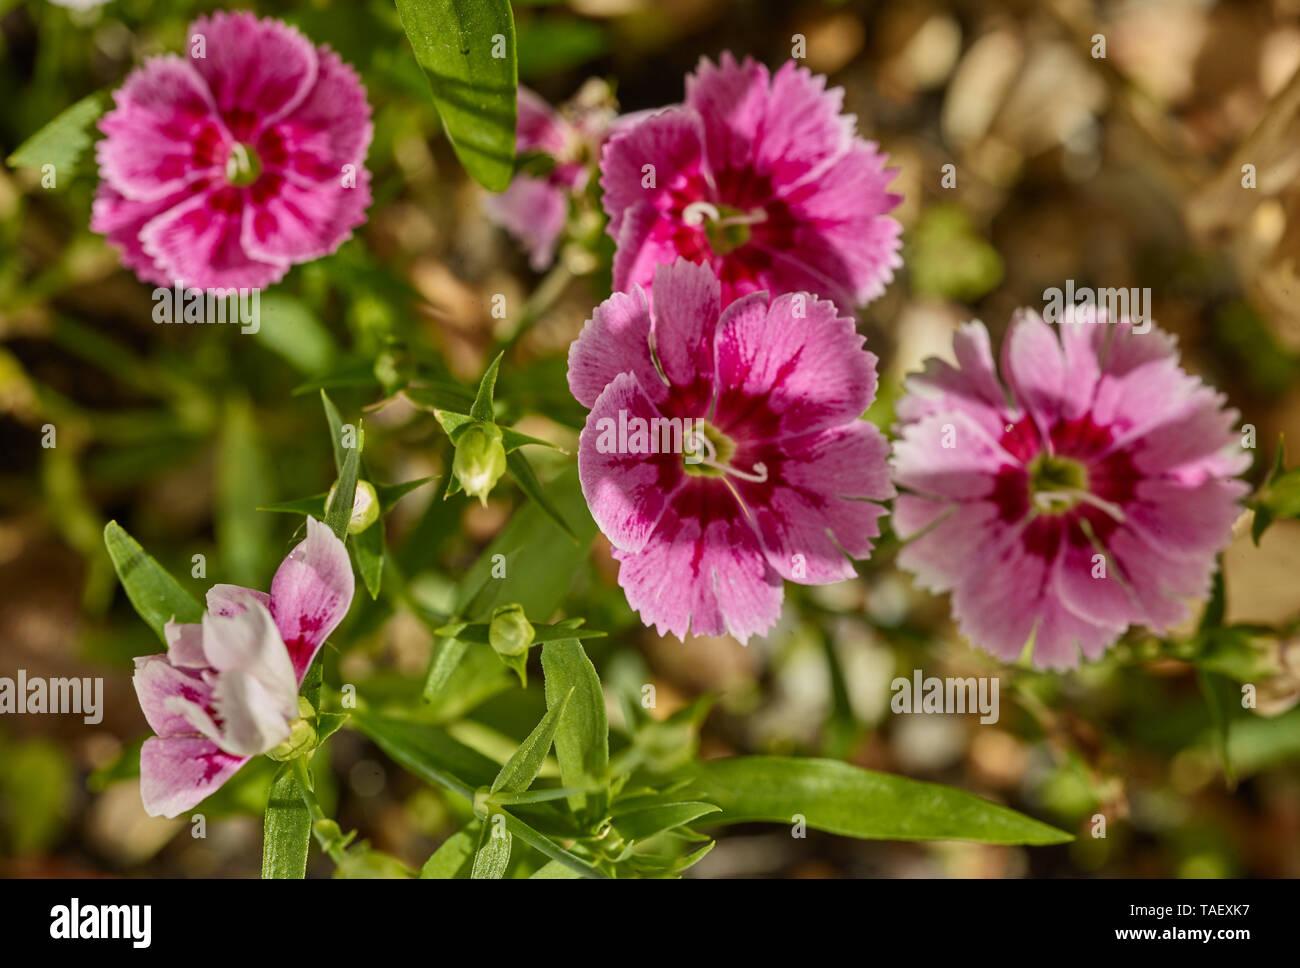 Dianthus plant portrait in a london urban garden, England United Kingdom, Europe - Stock Image